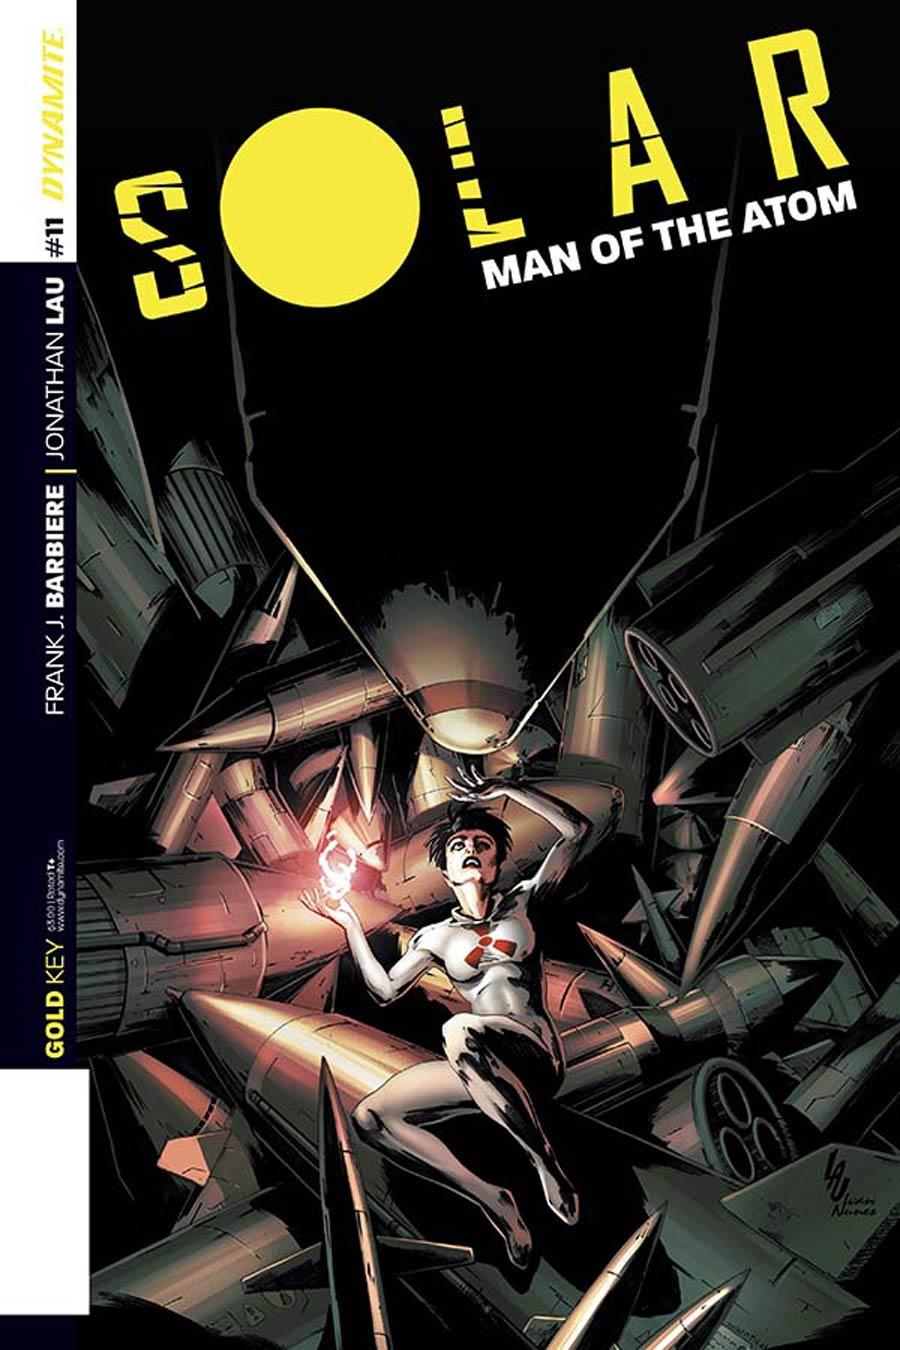 Solar Man Of The Atom Vol 2 #11 Cover B Variant Jonathan Lau Subscription Cover